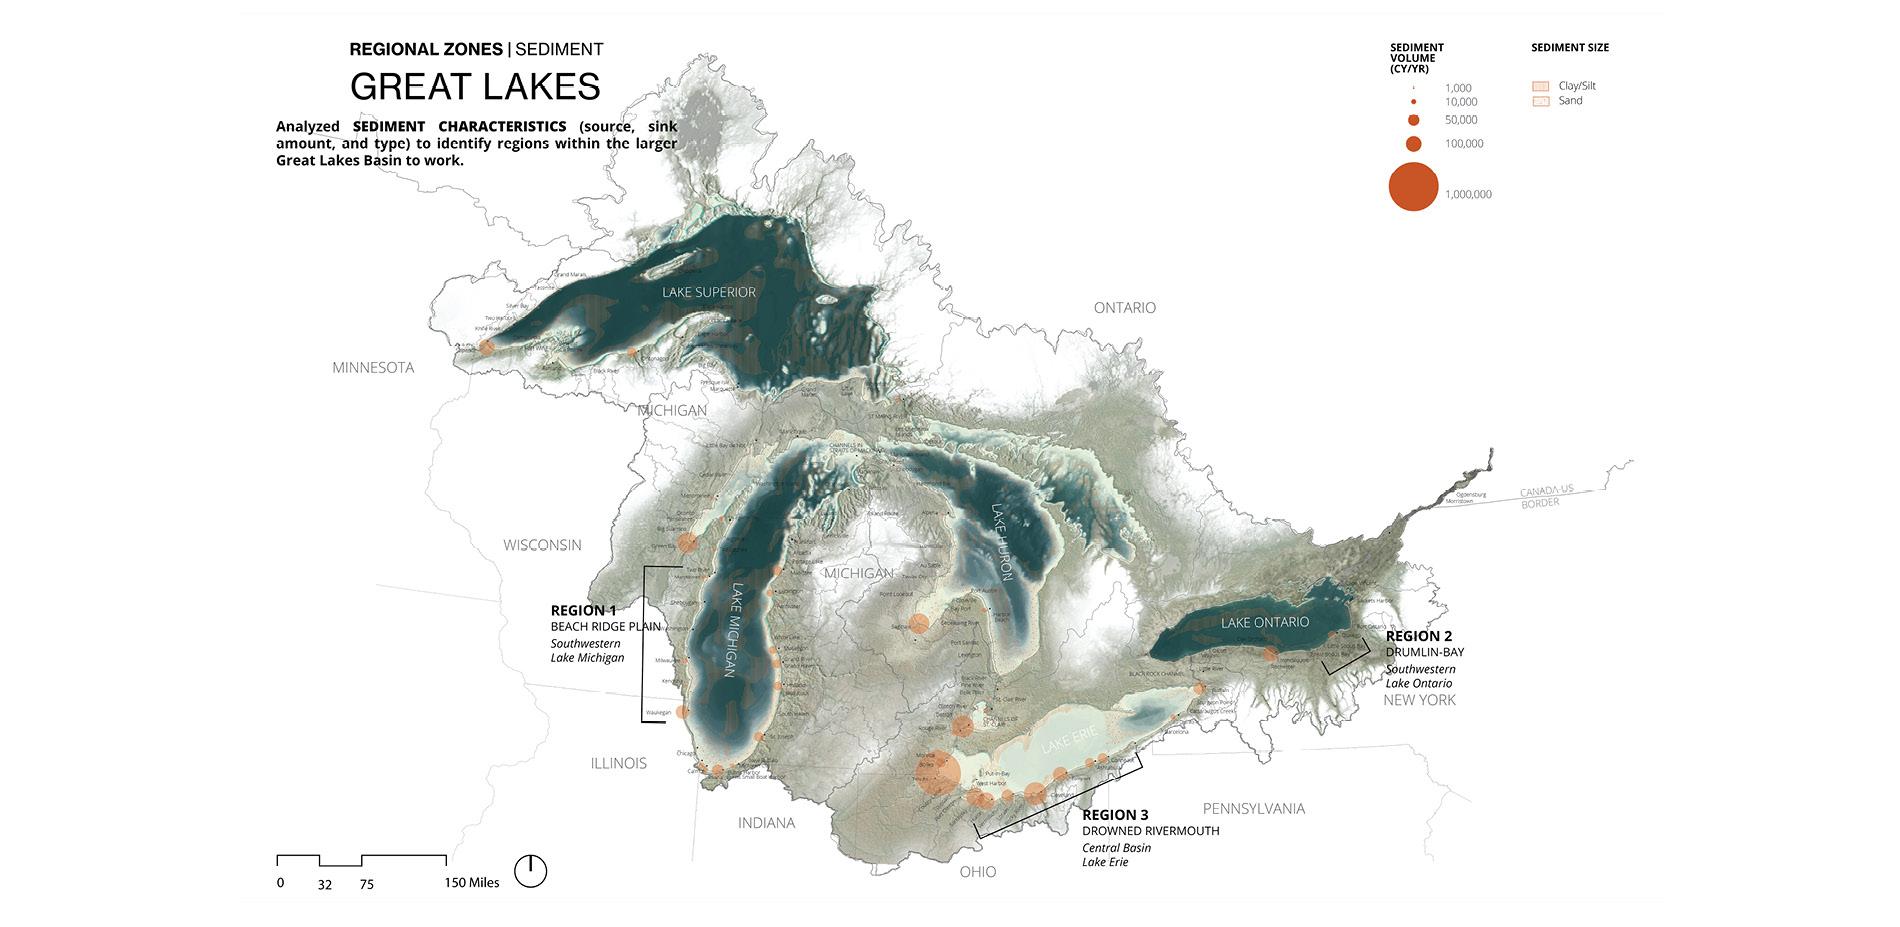 Great Lakes Basin: Sediments